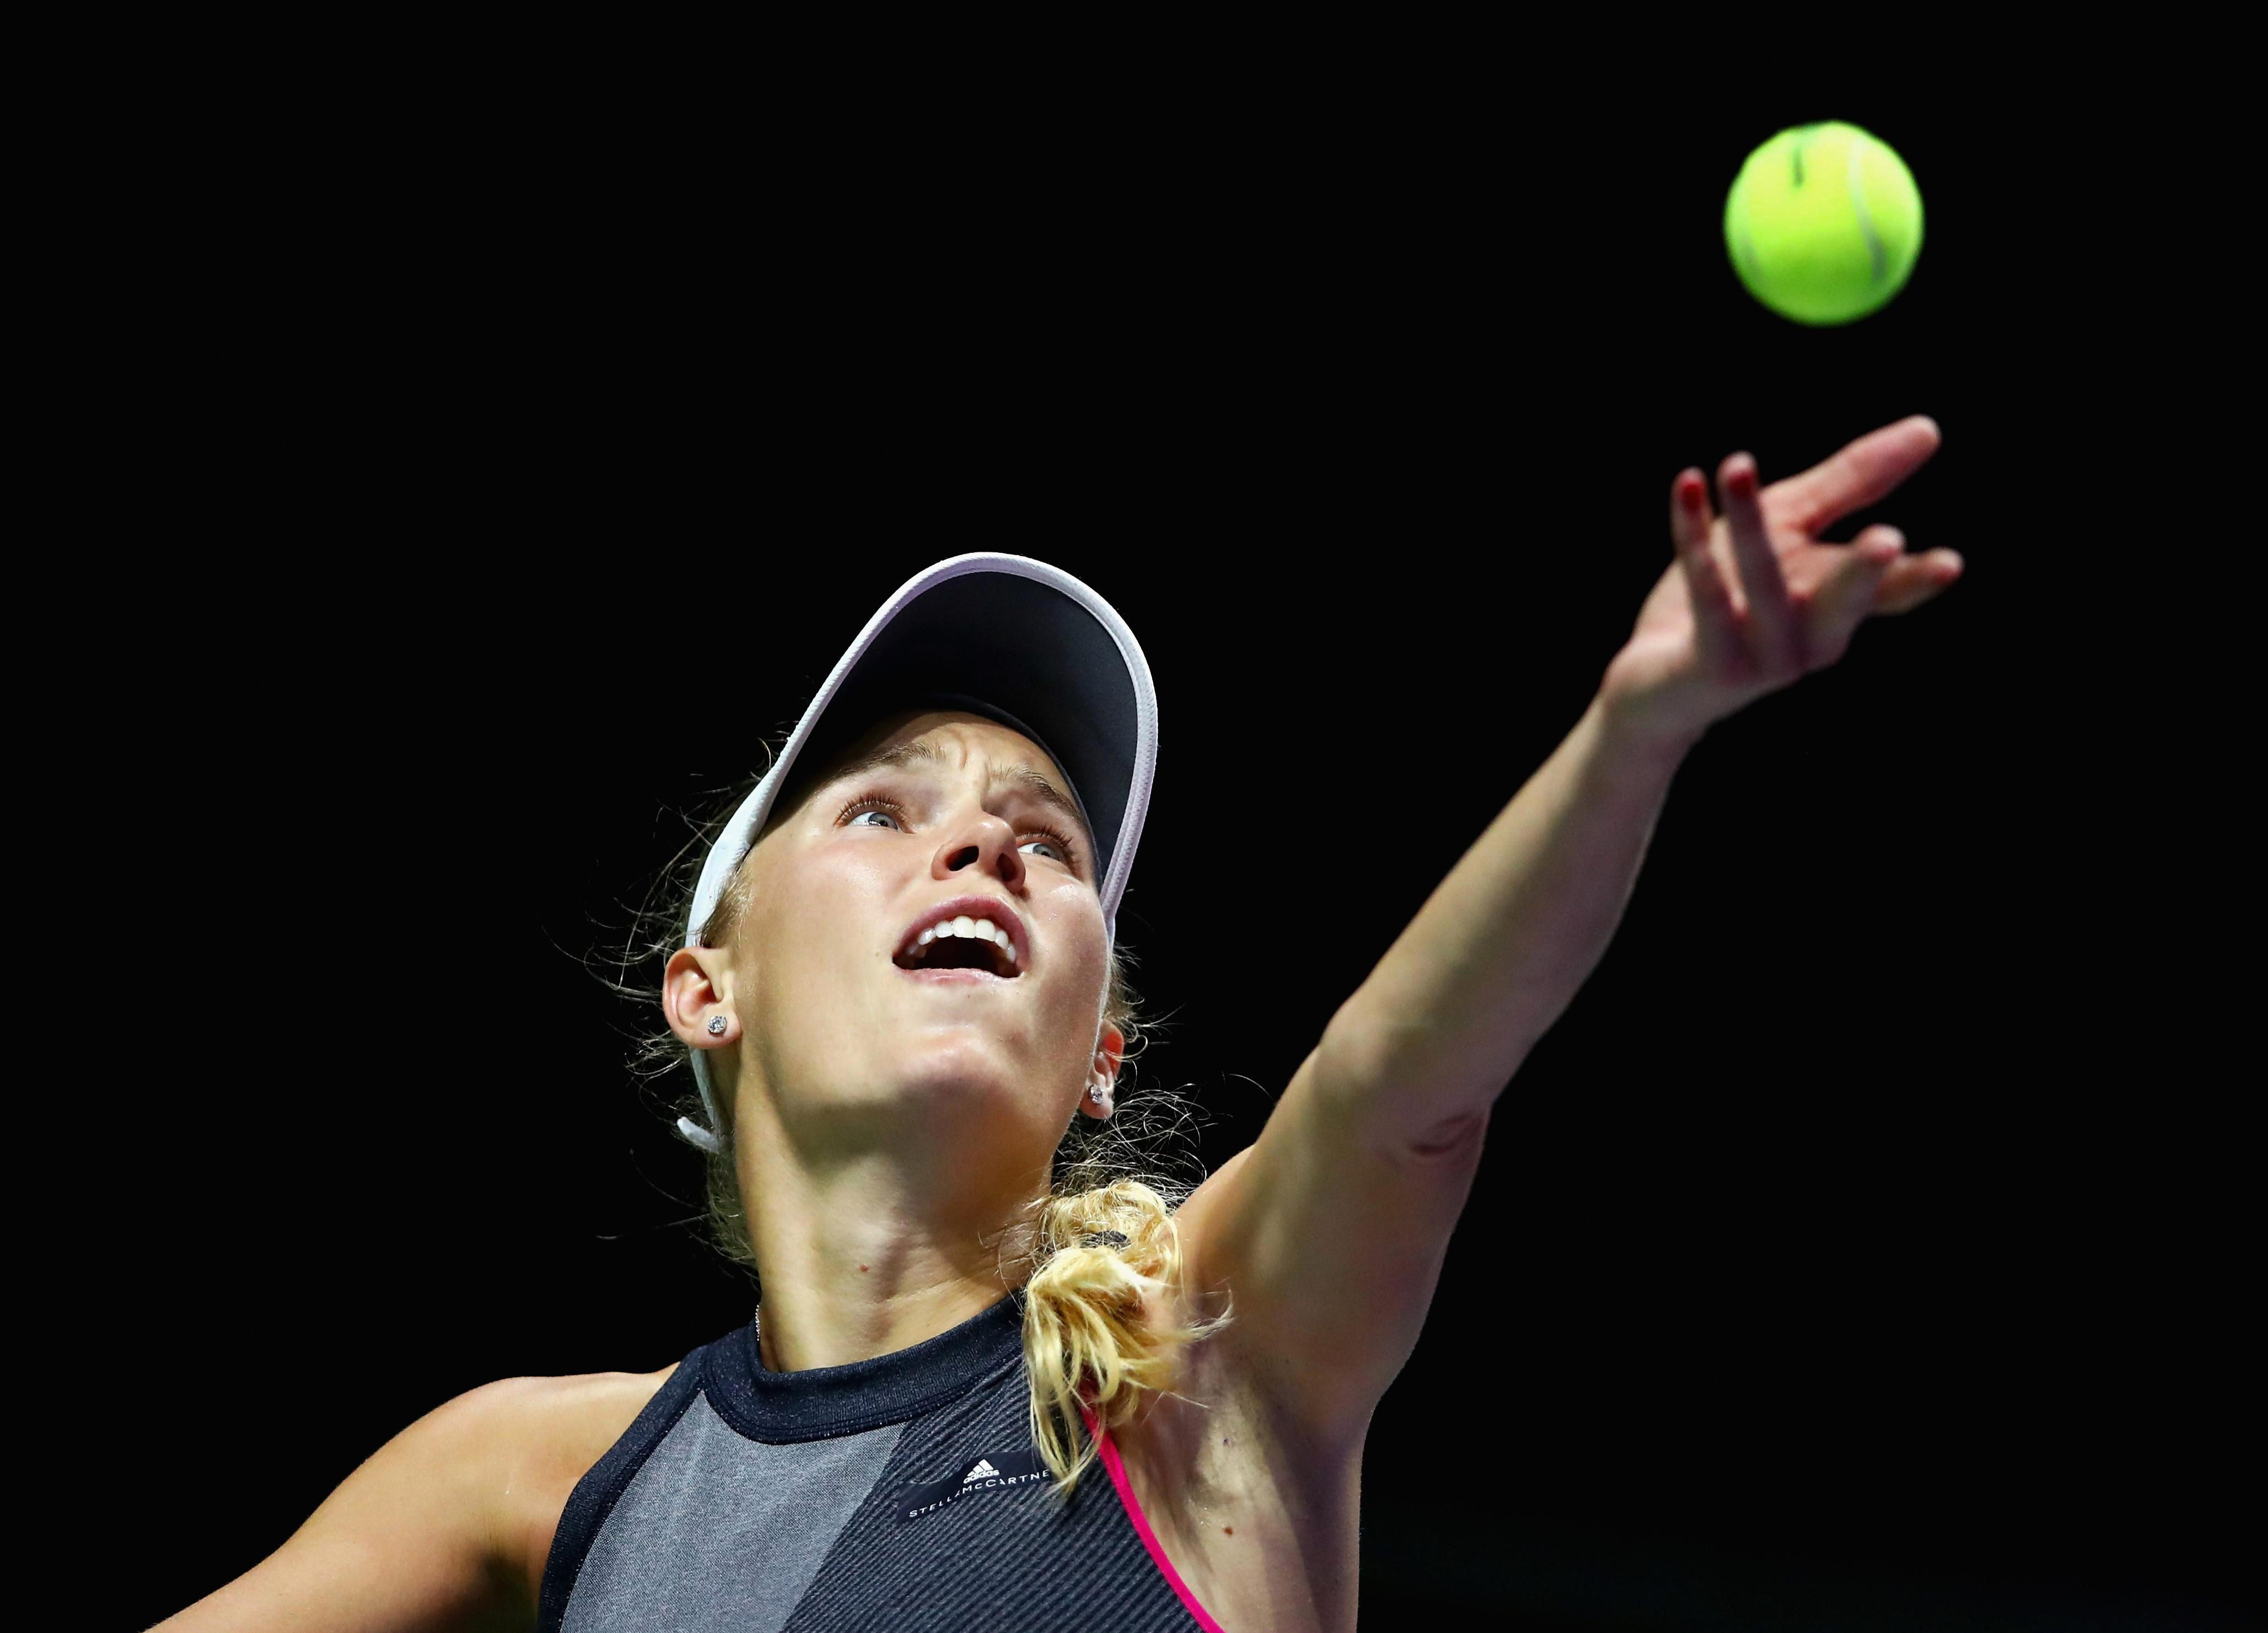 Caroline Wozniacki could knock Halep off the top spot with a win